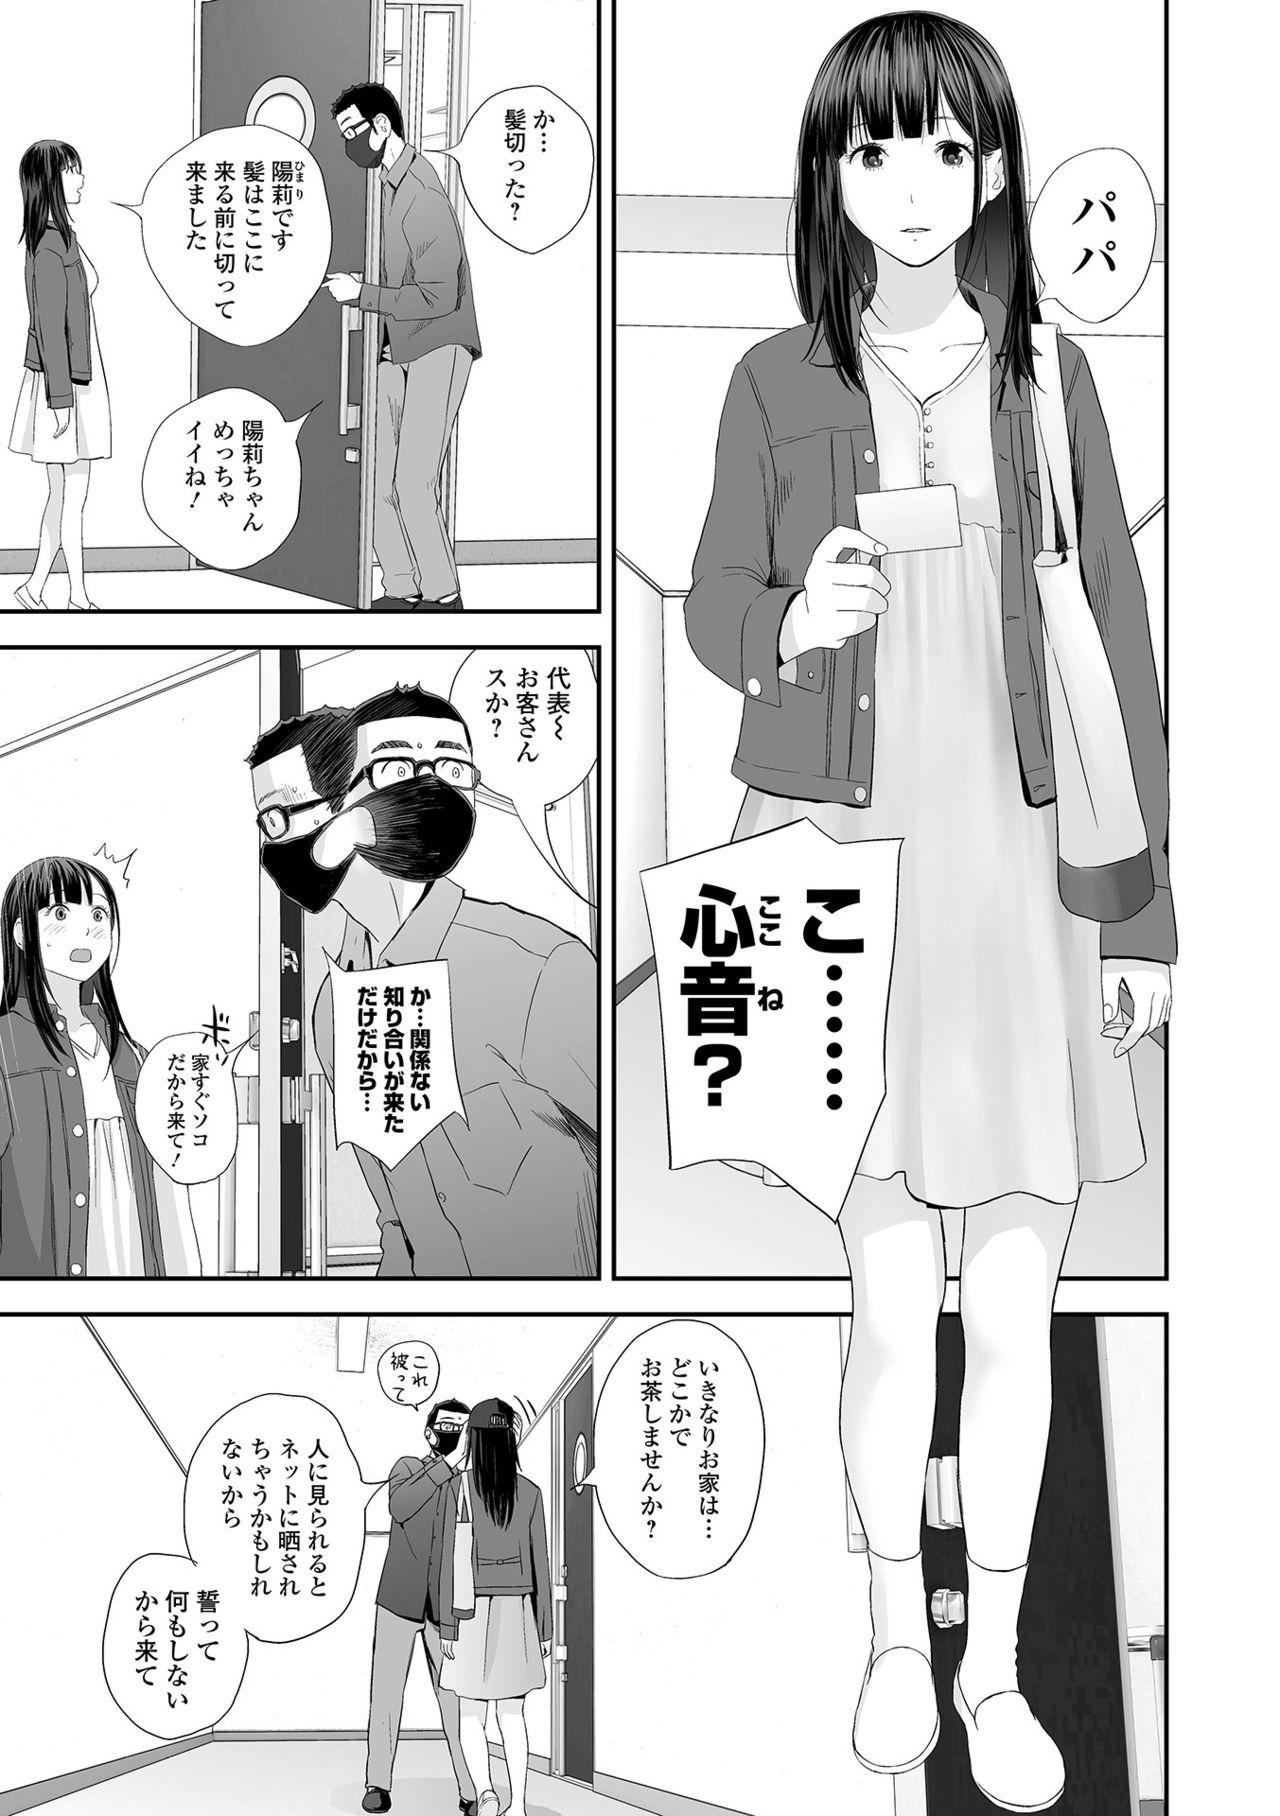 COMIC Shigekiteki SQUIRT!! Vol. 25 46